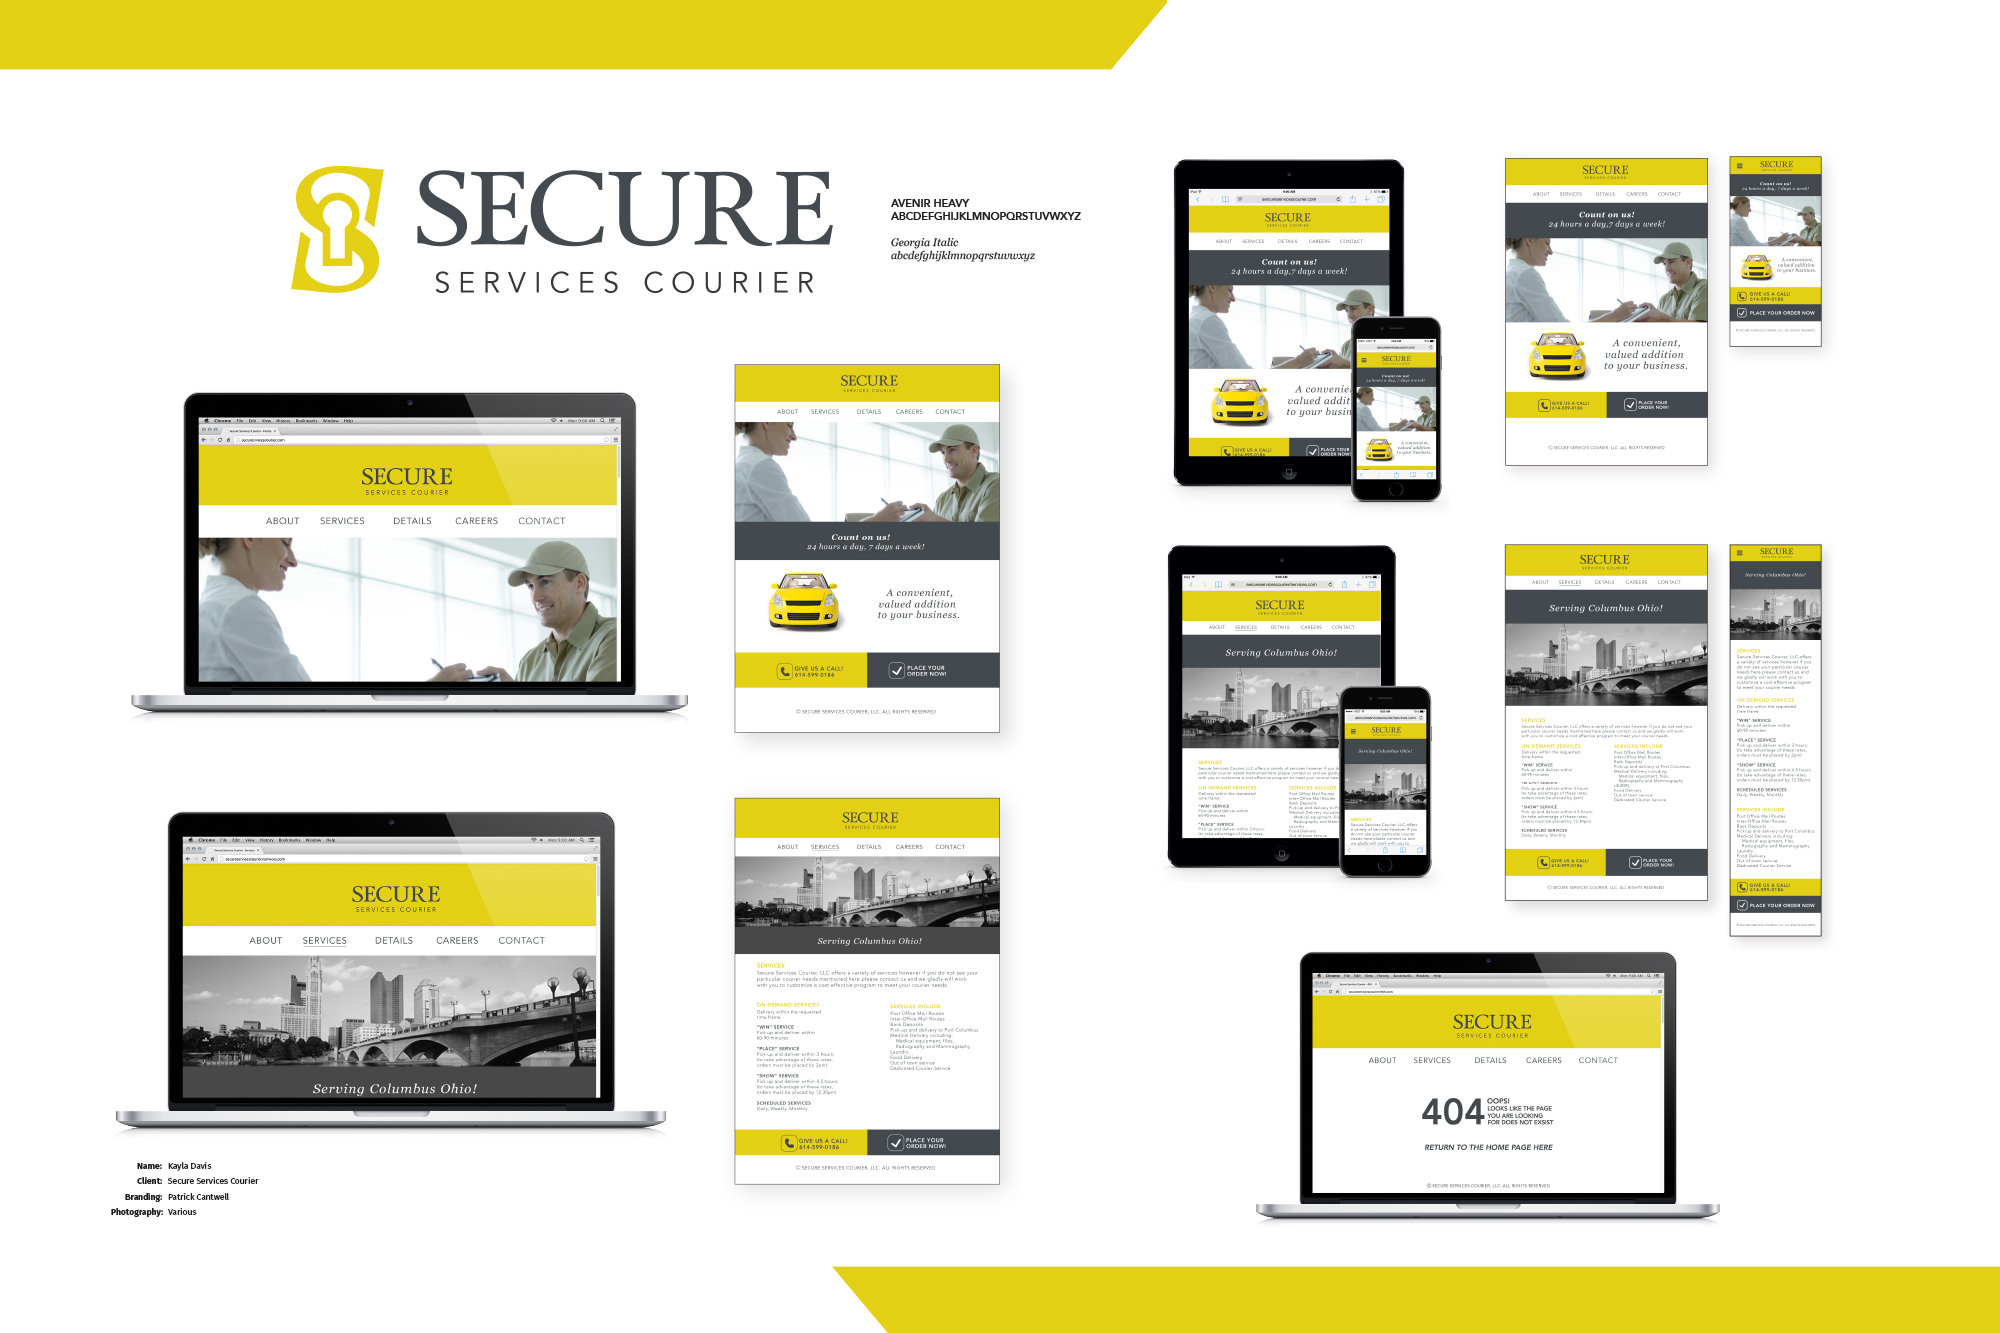 ADVE3630_Bennett_Responsive Site Design_Kayla Davis.jpg